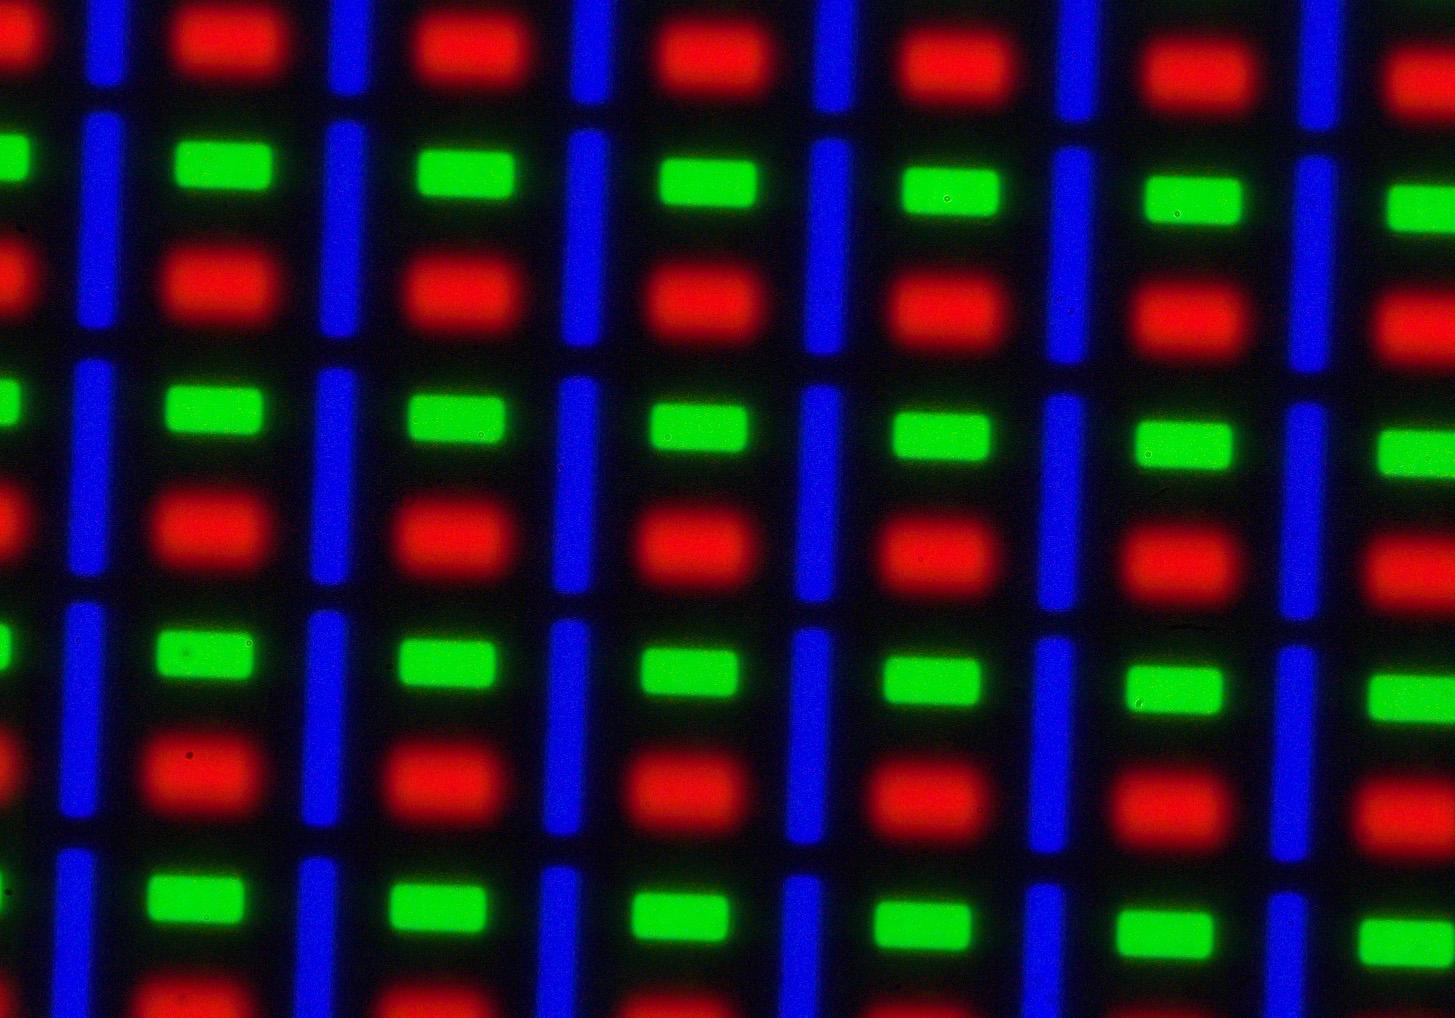 AMOLED Screen Comparison At A Microscopic Level. Galaxy S2